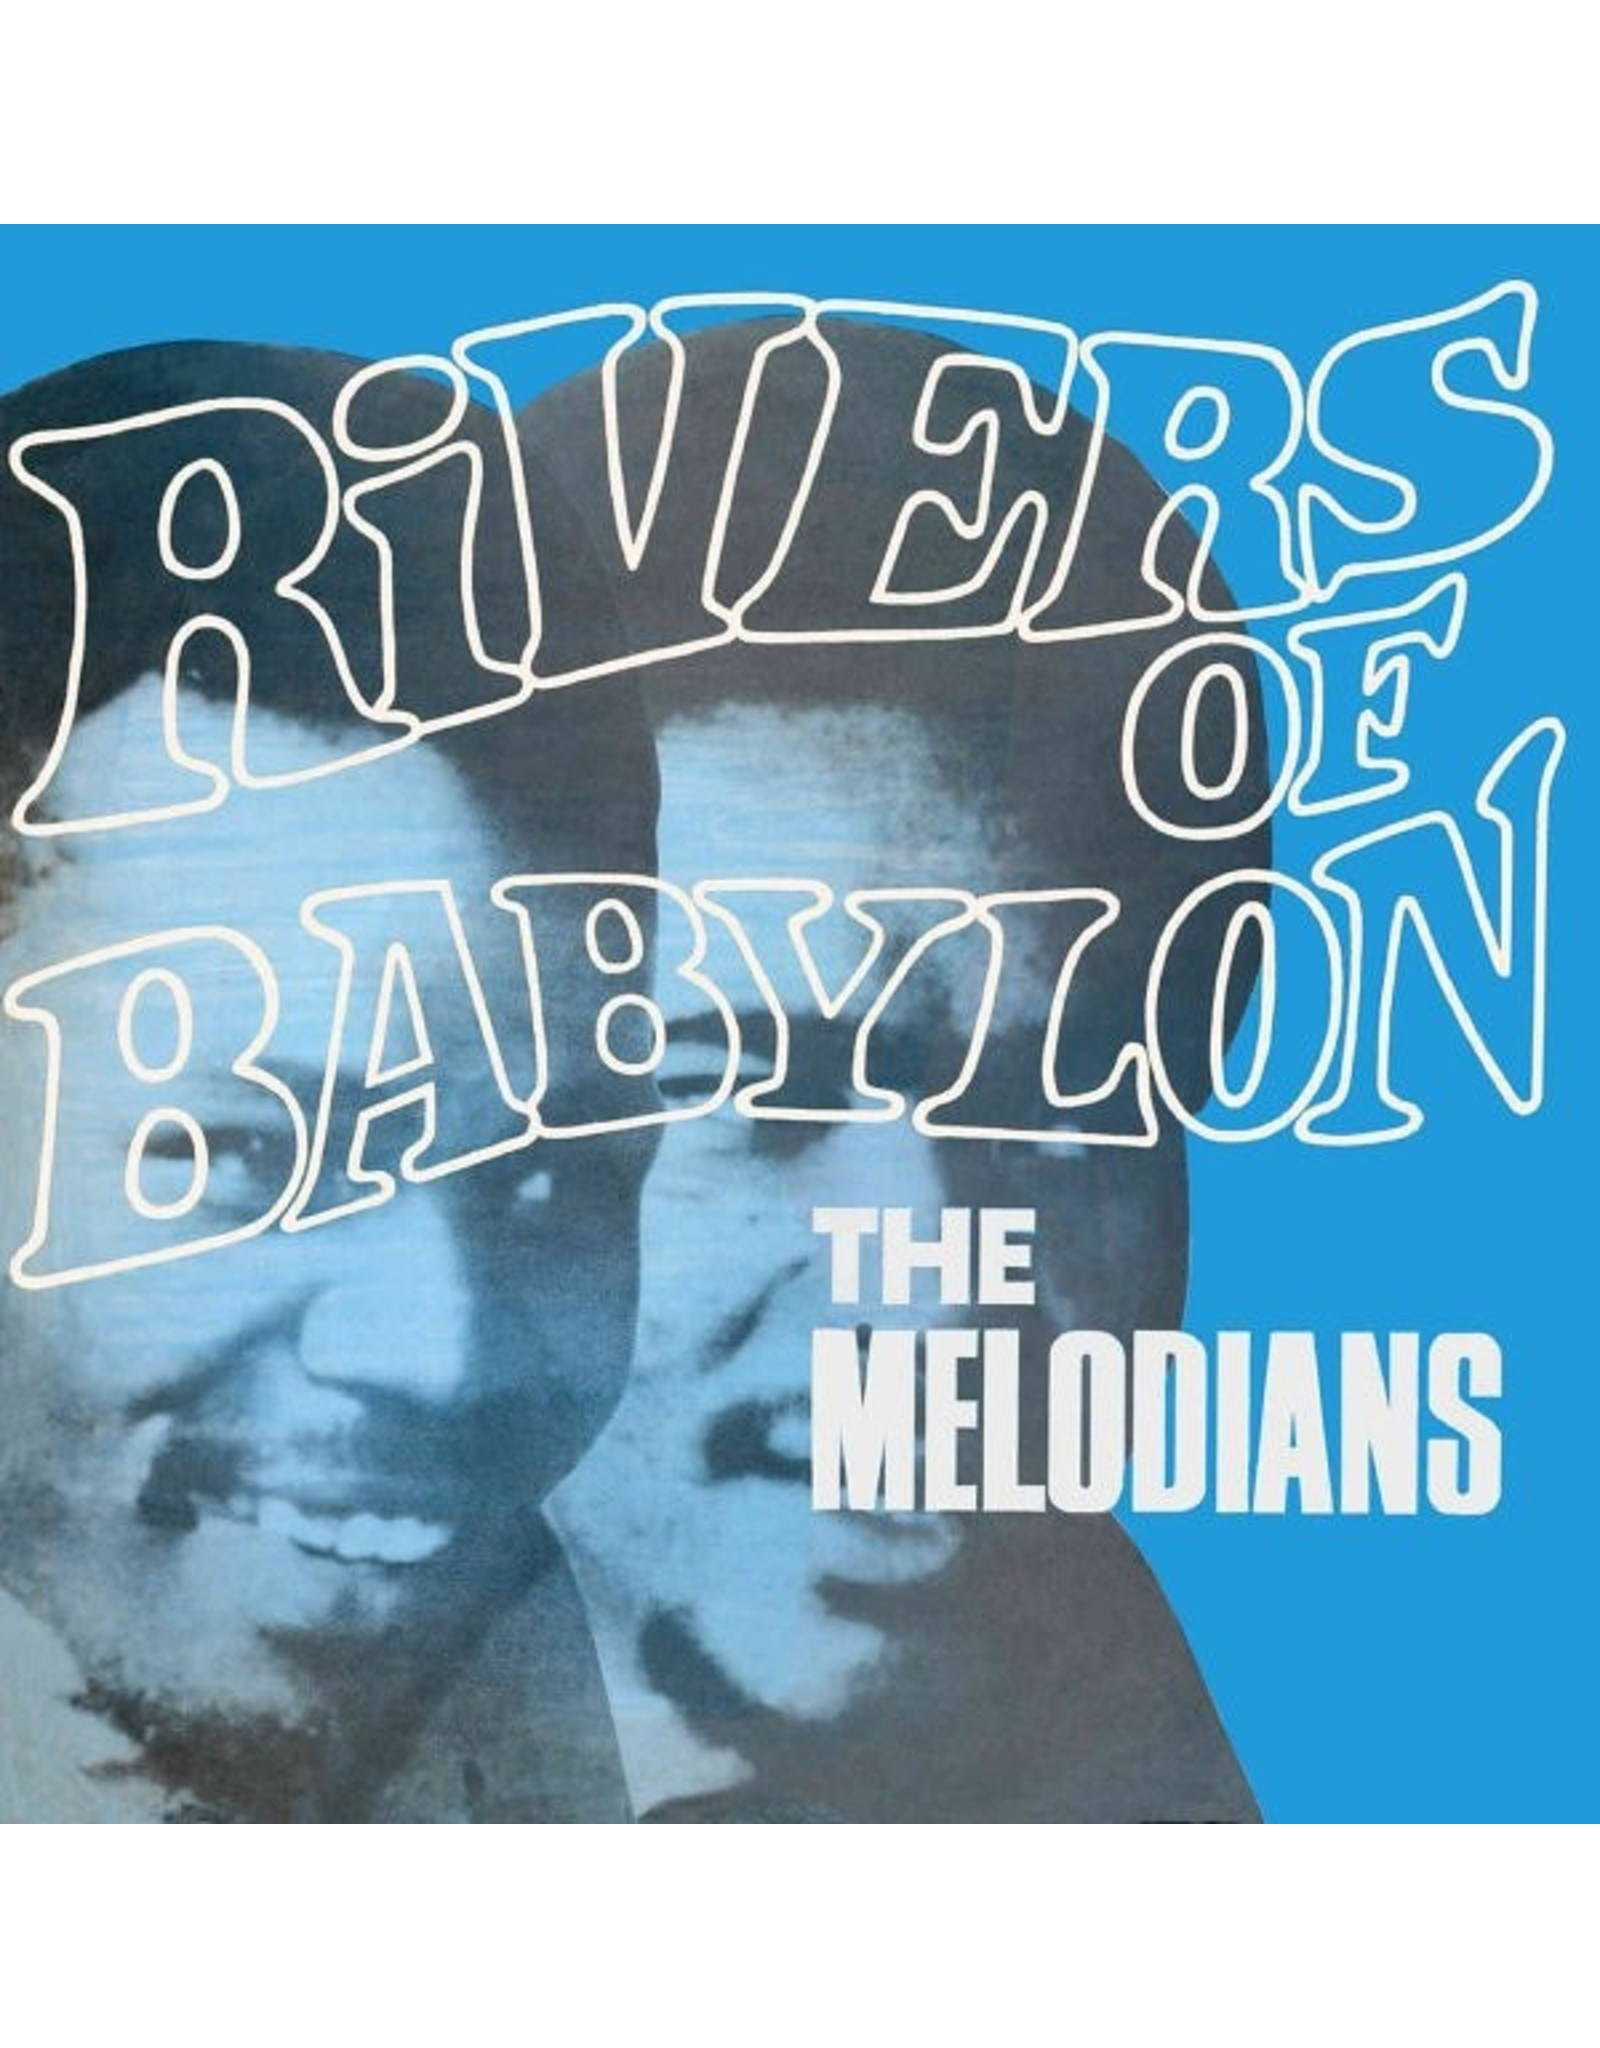 The Melodians - Rivers Of Babylon LP